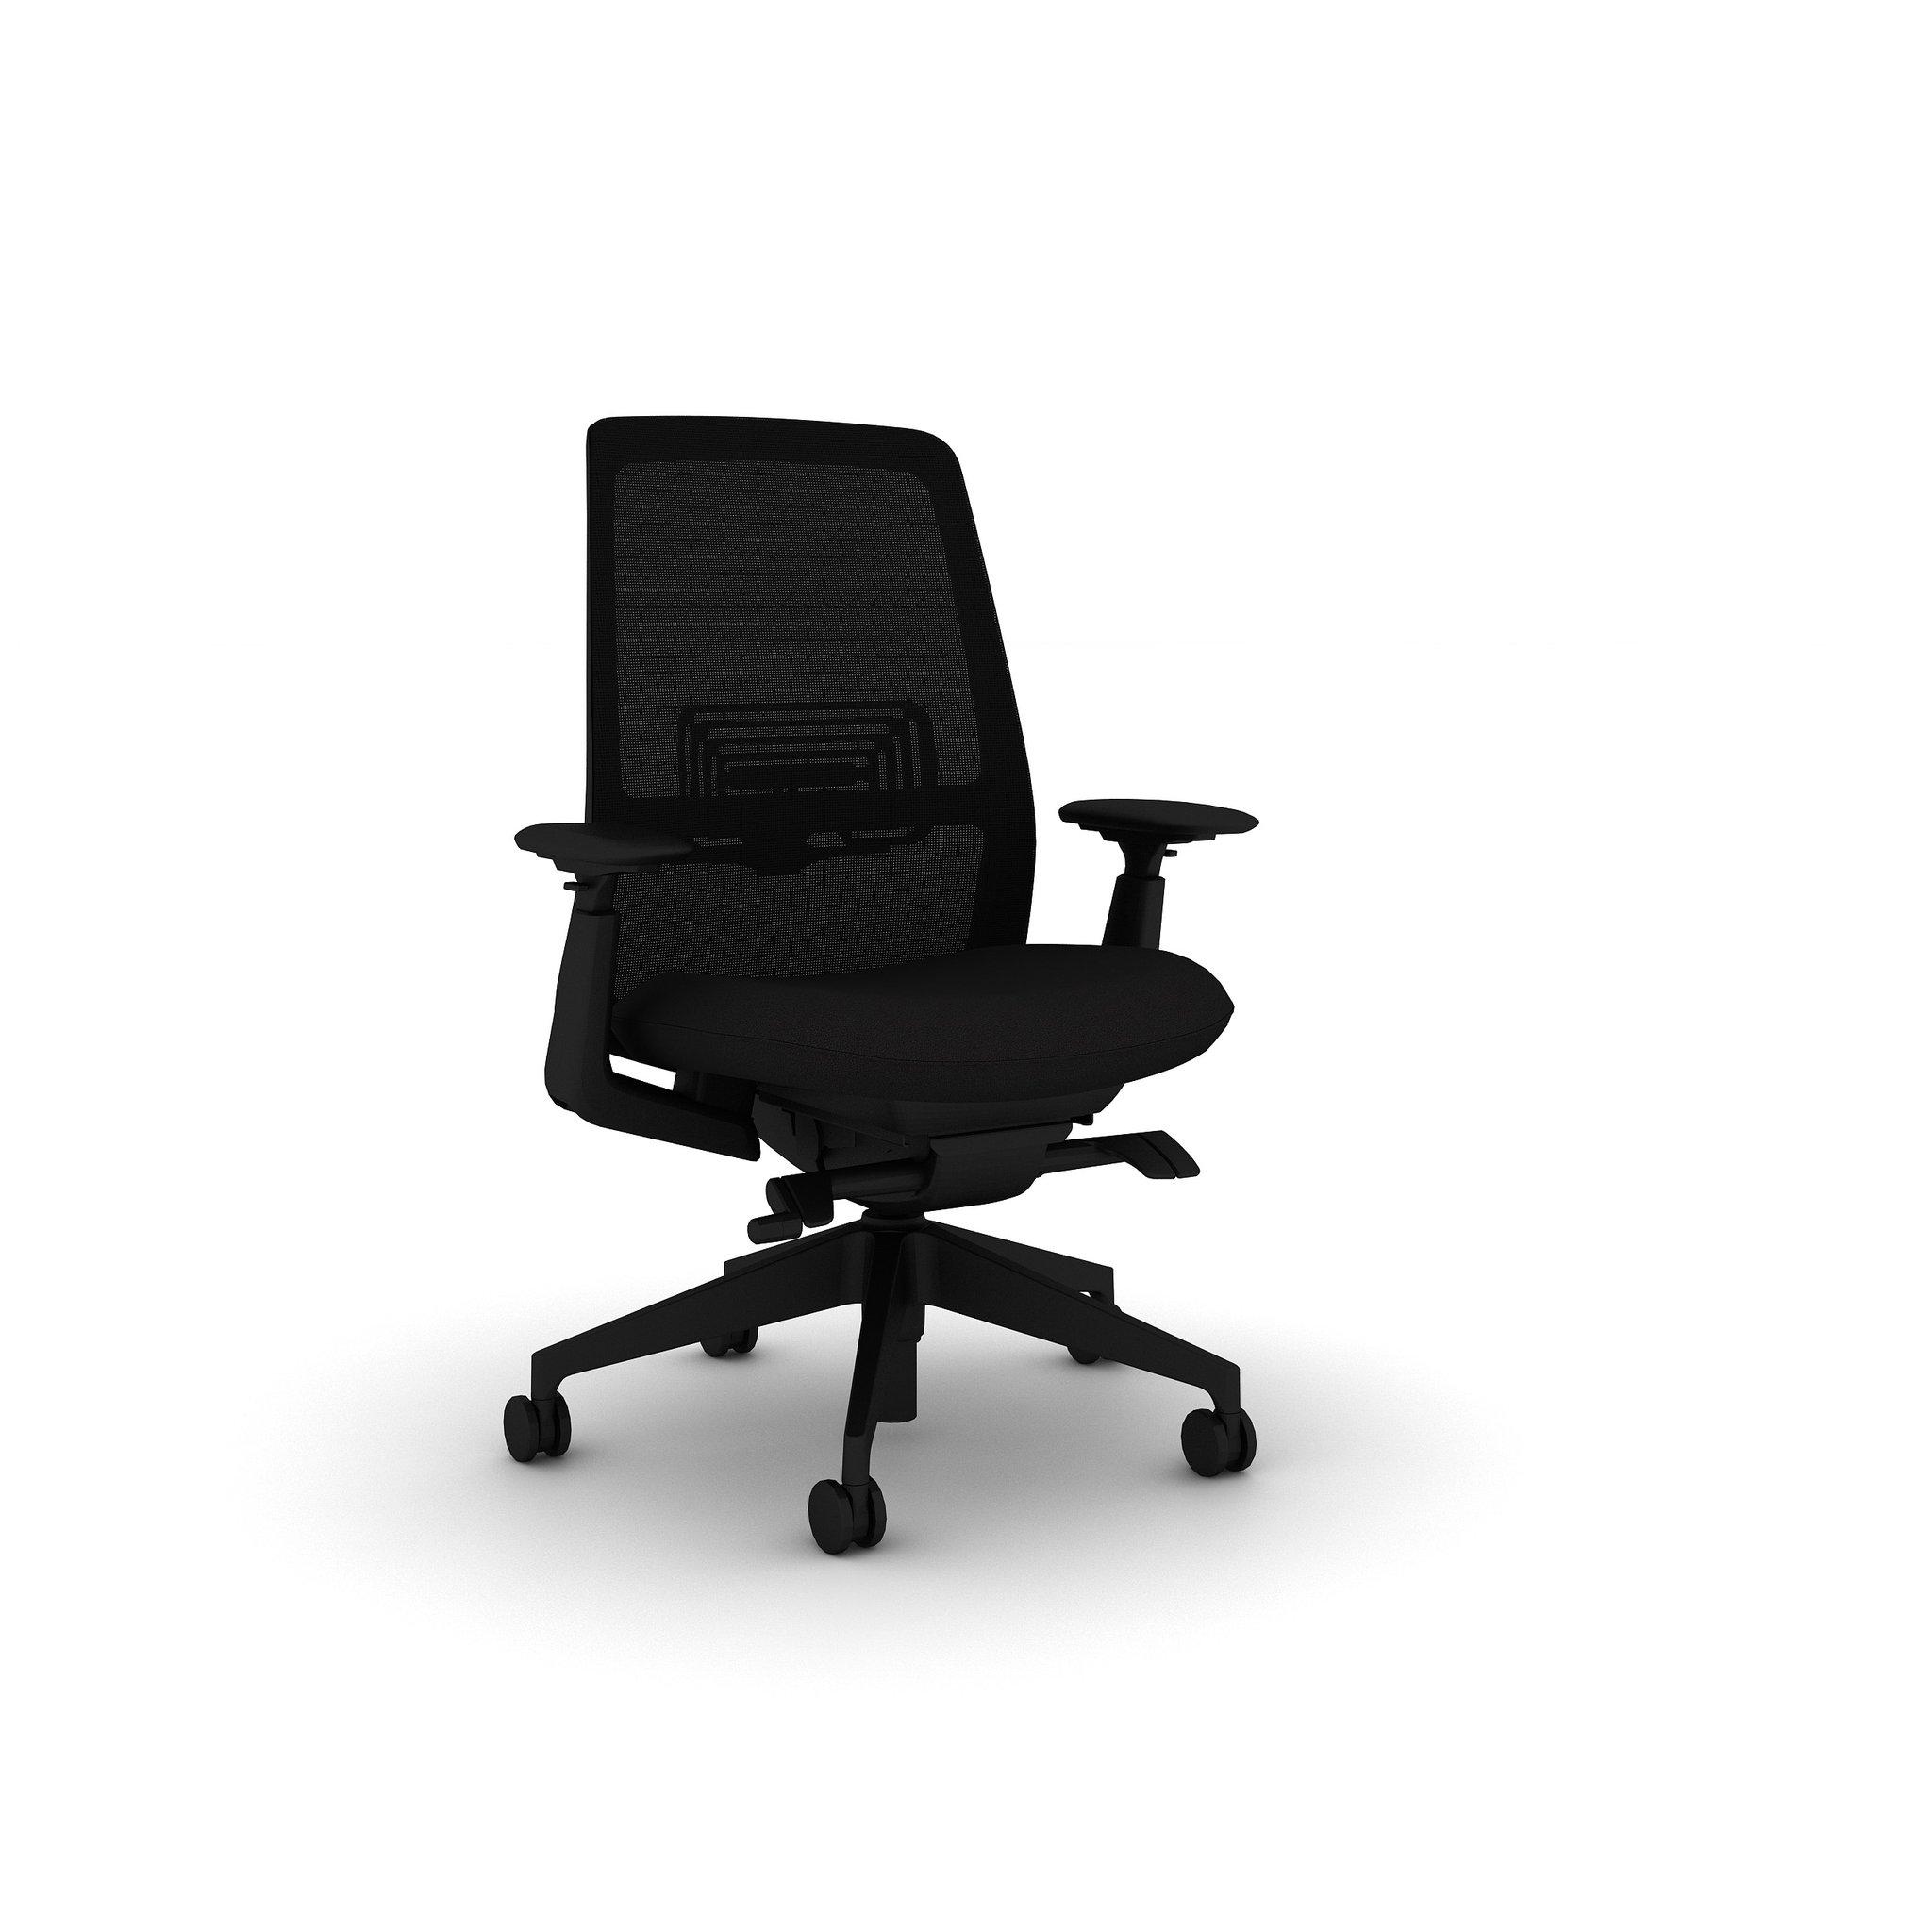 Haworth Soji Basic Model - Black